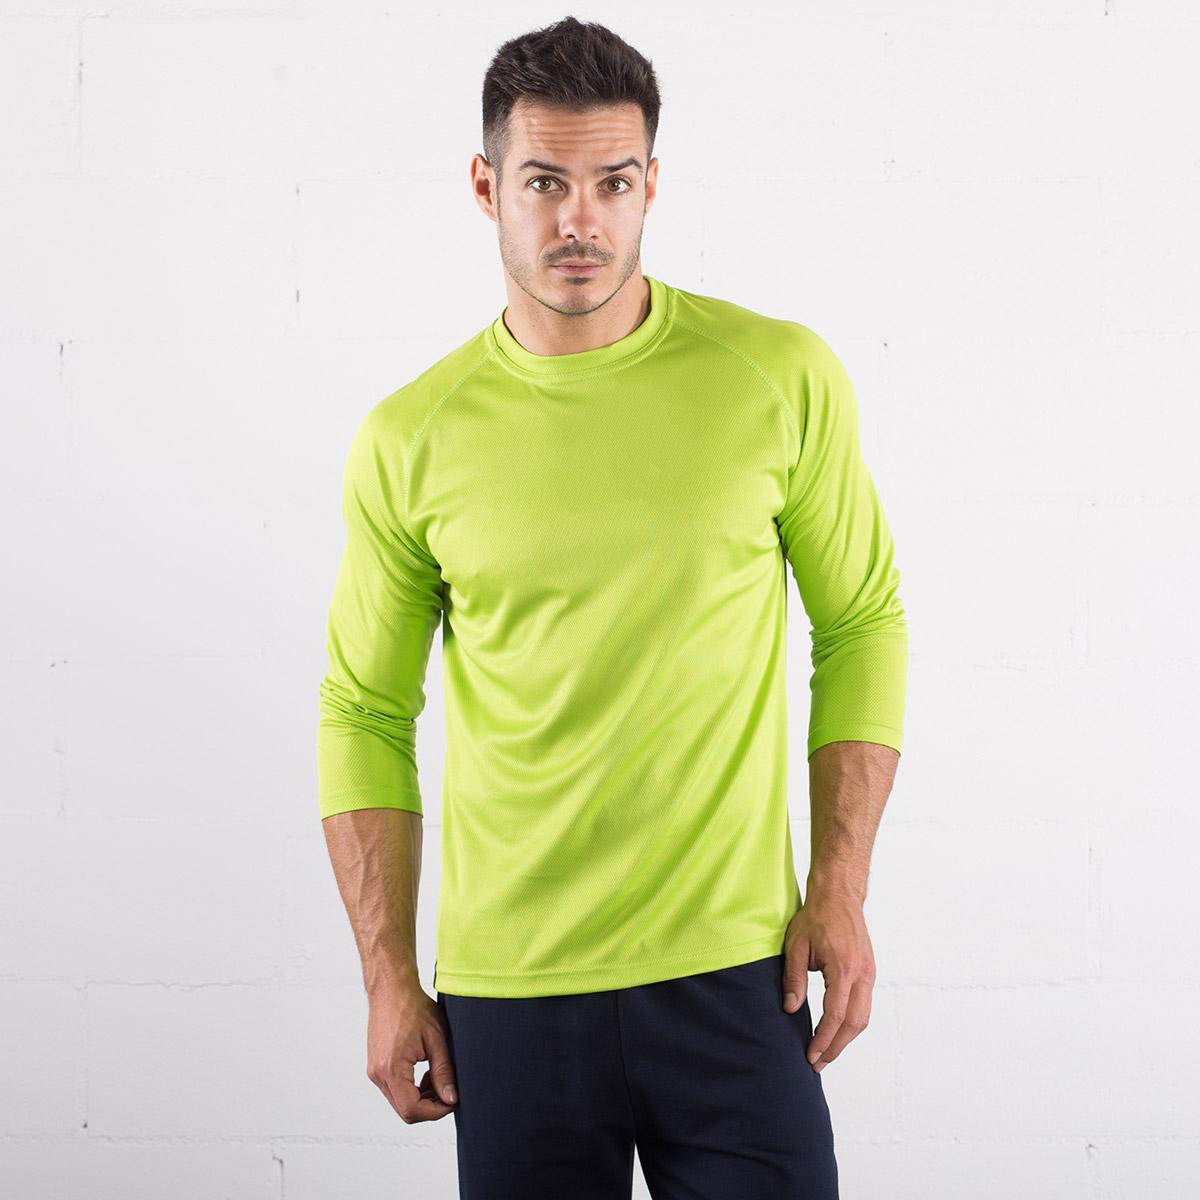 T-shirt Sport Manica Lunga Sprintex - Vestilogo 0eaa20a562b